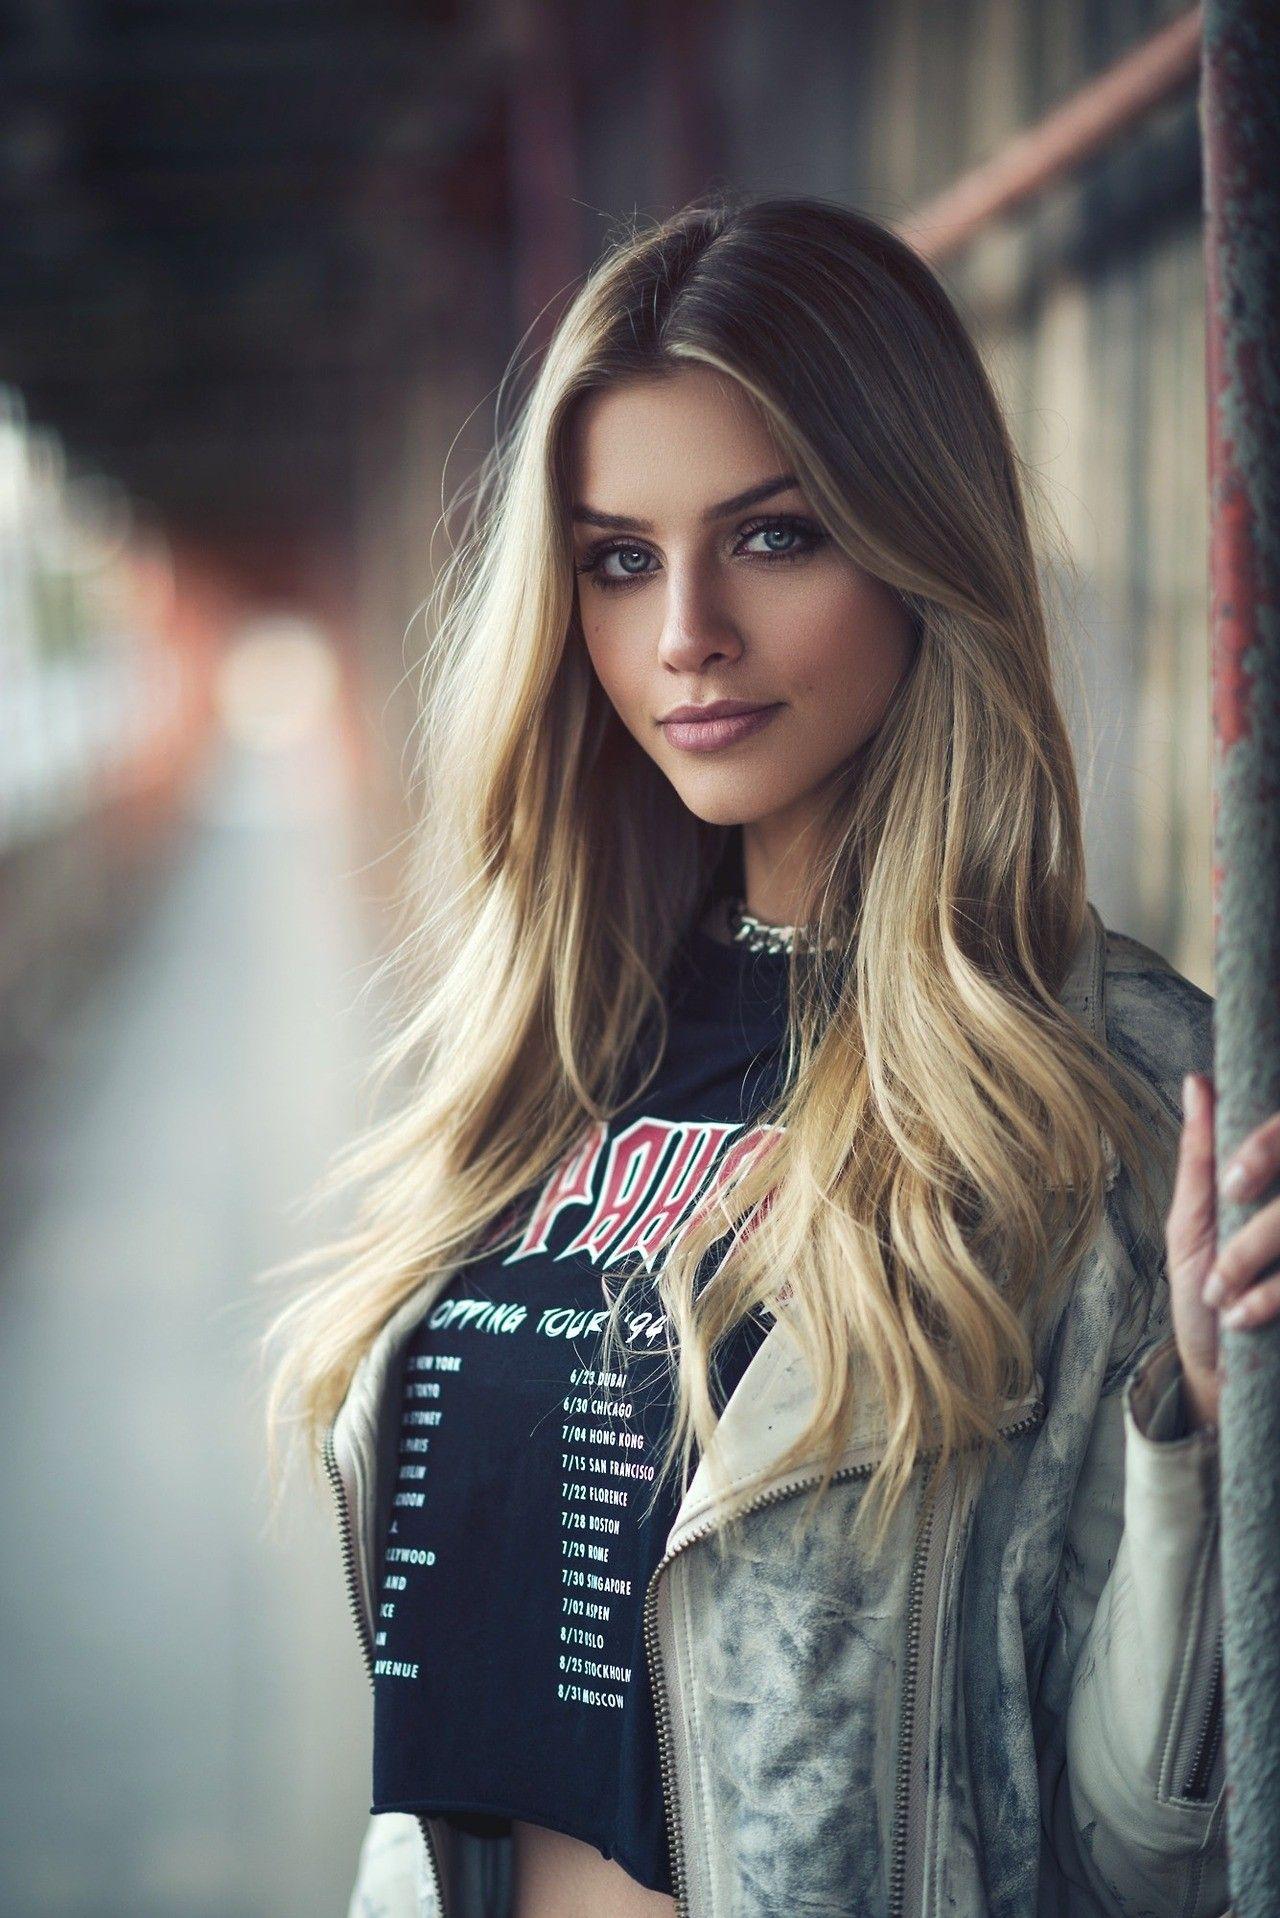 beautiful girl | beauty in 2019 | marina laswick, beauty, beautiful